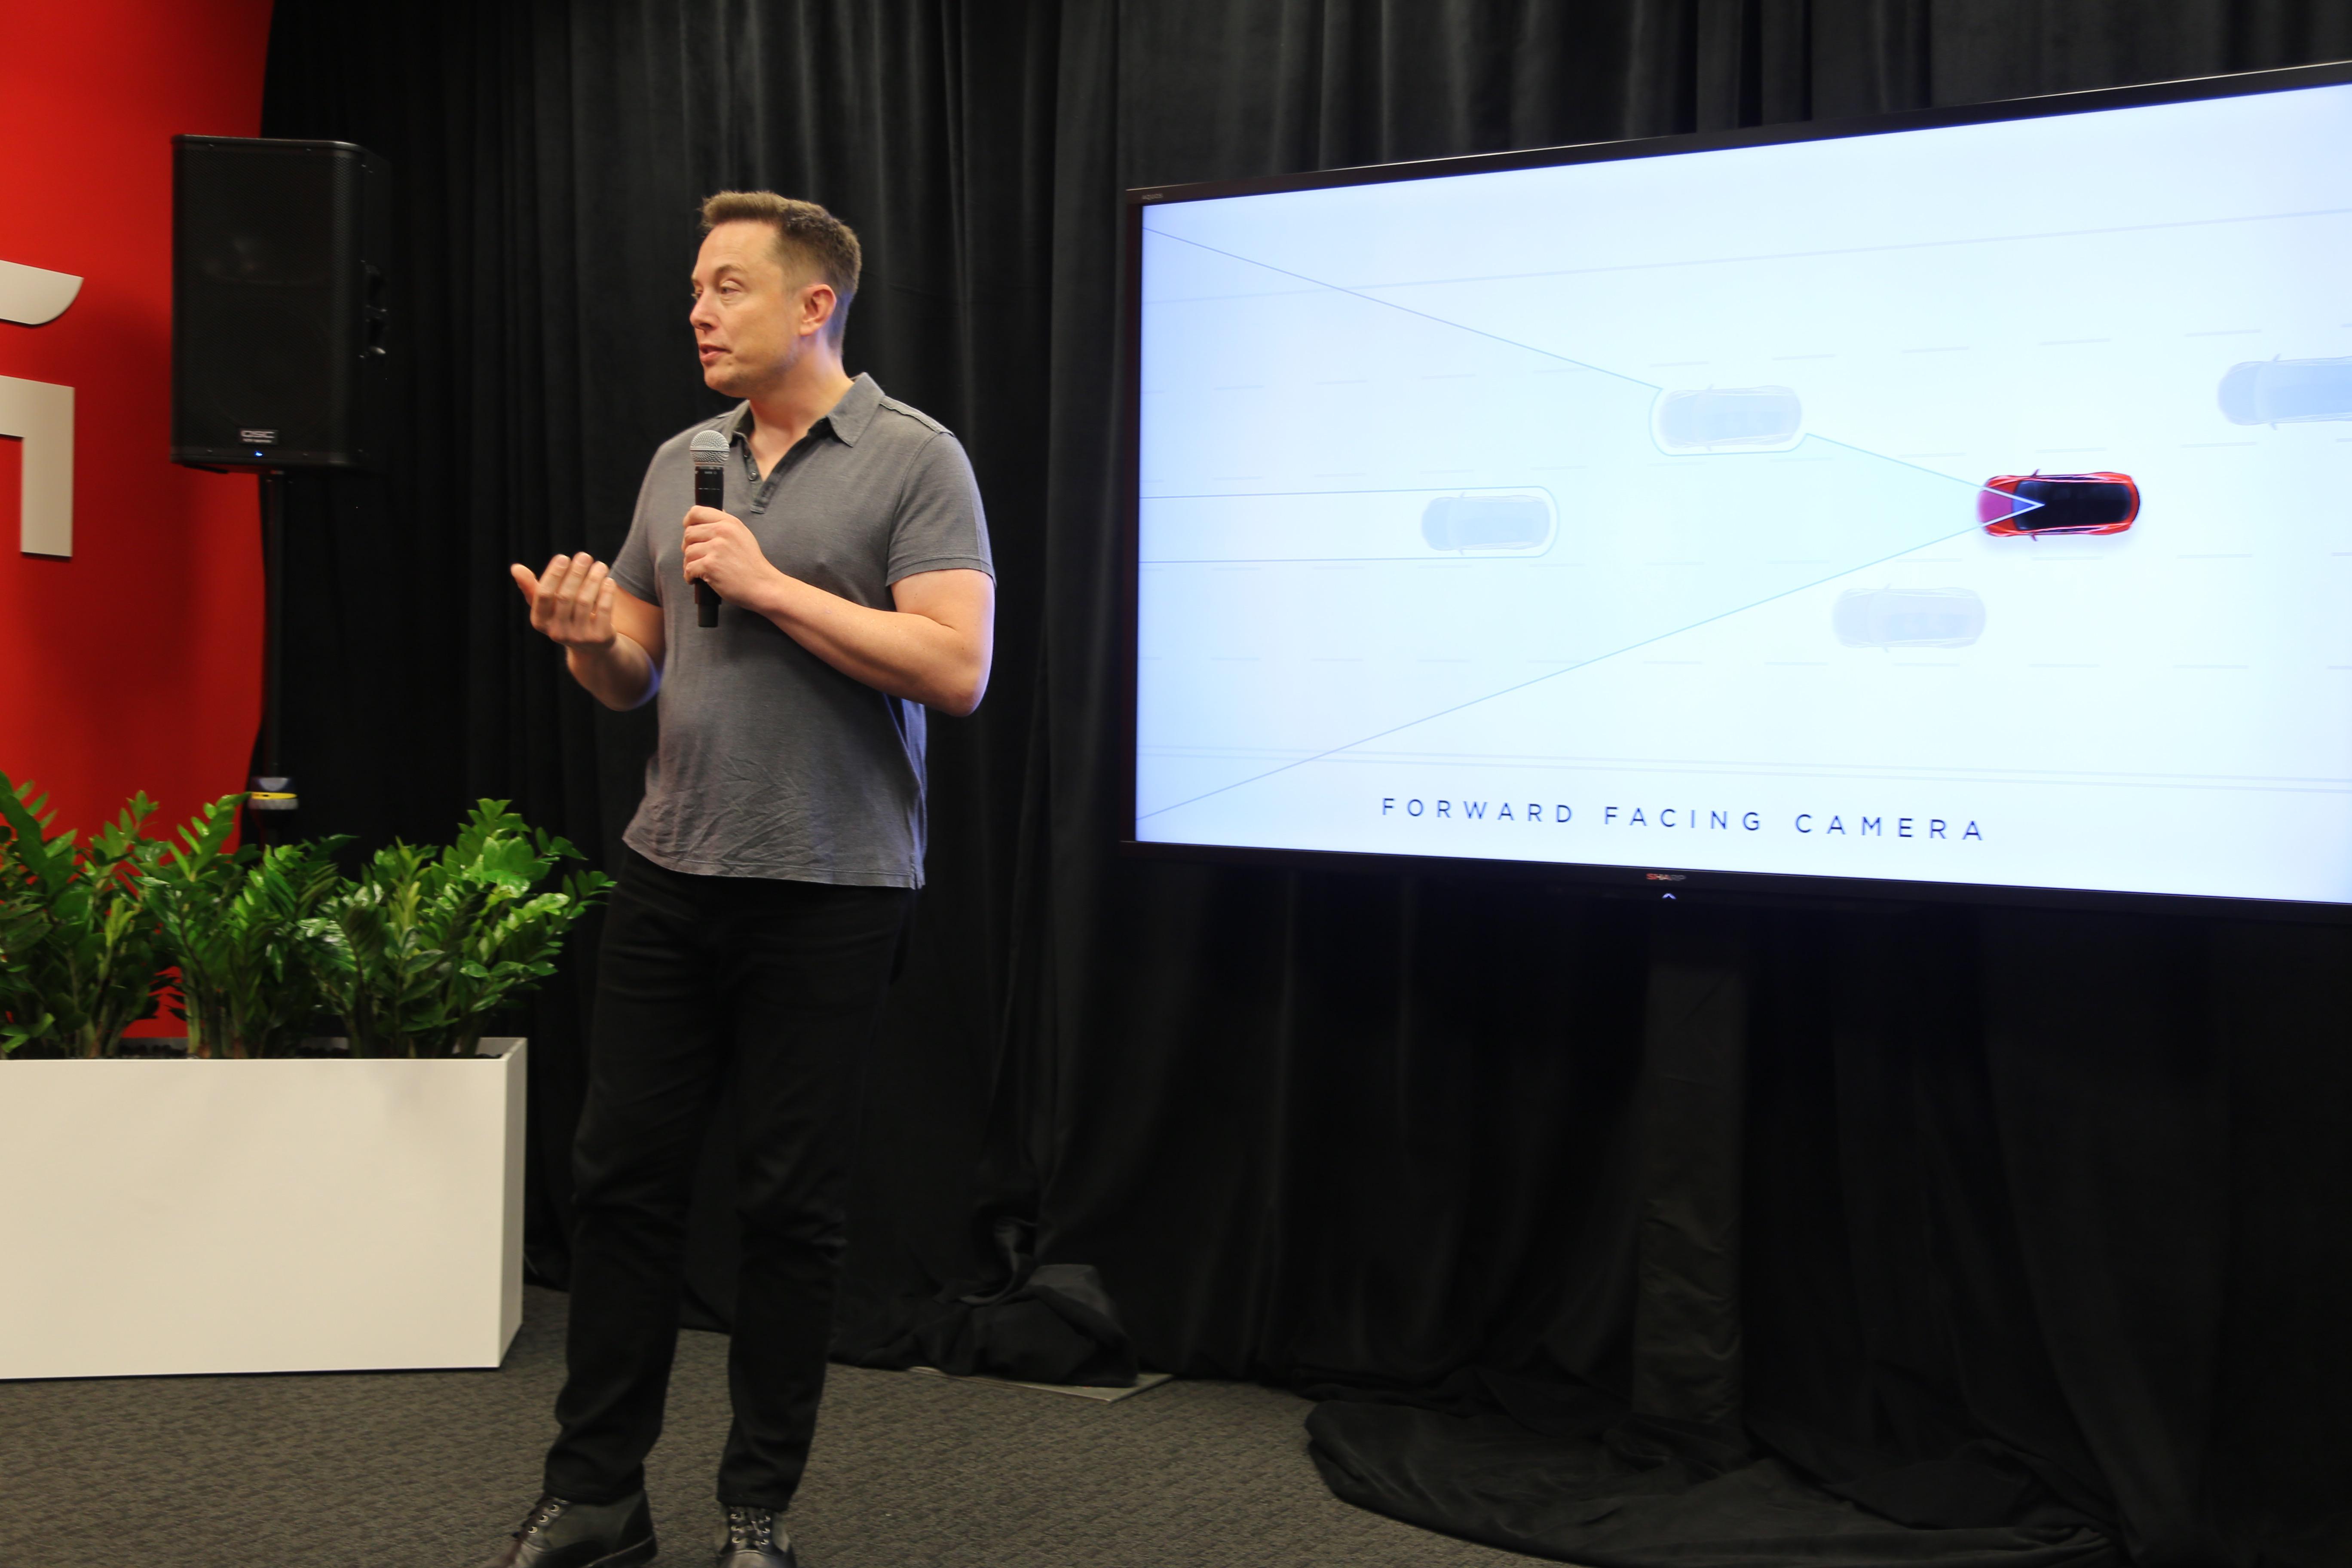 How Tesla's autopilot learns | Fortune